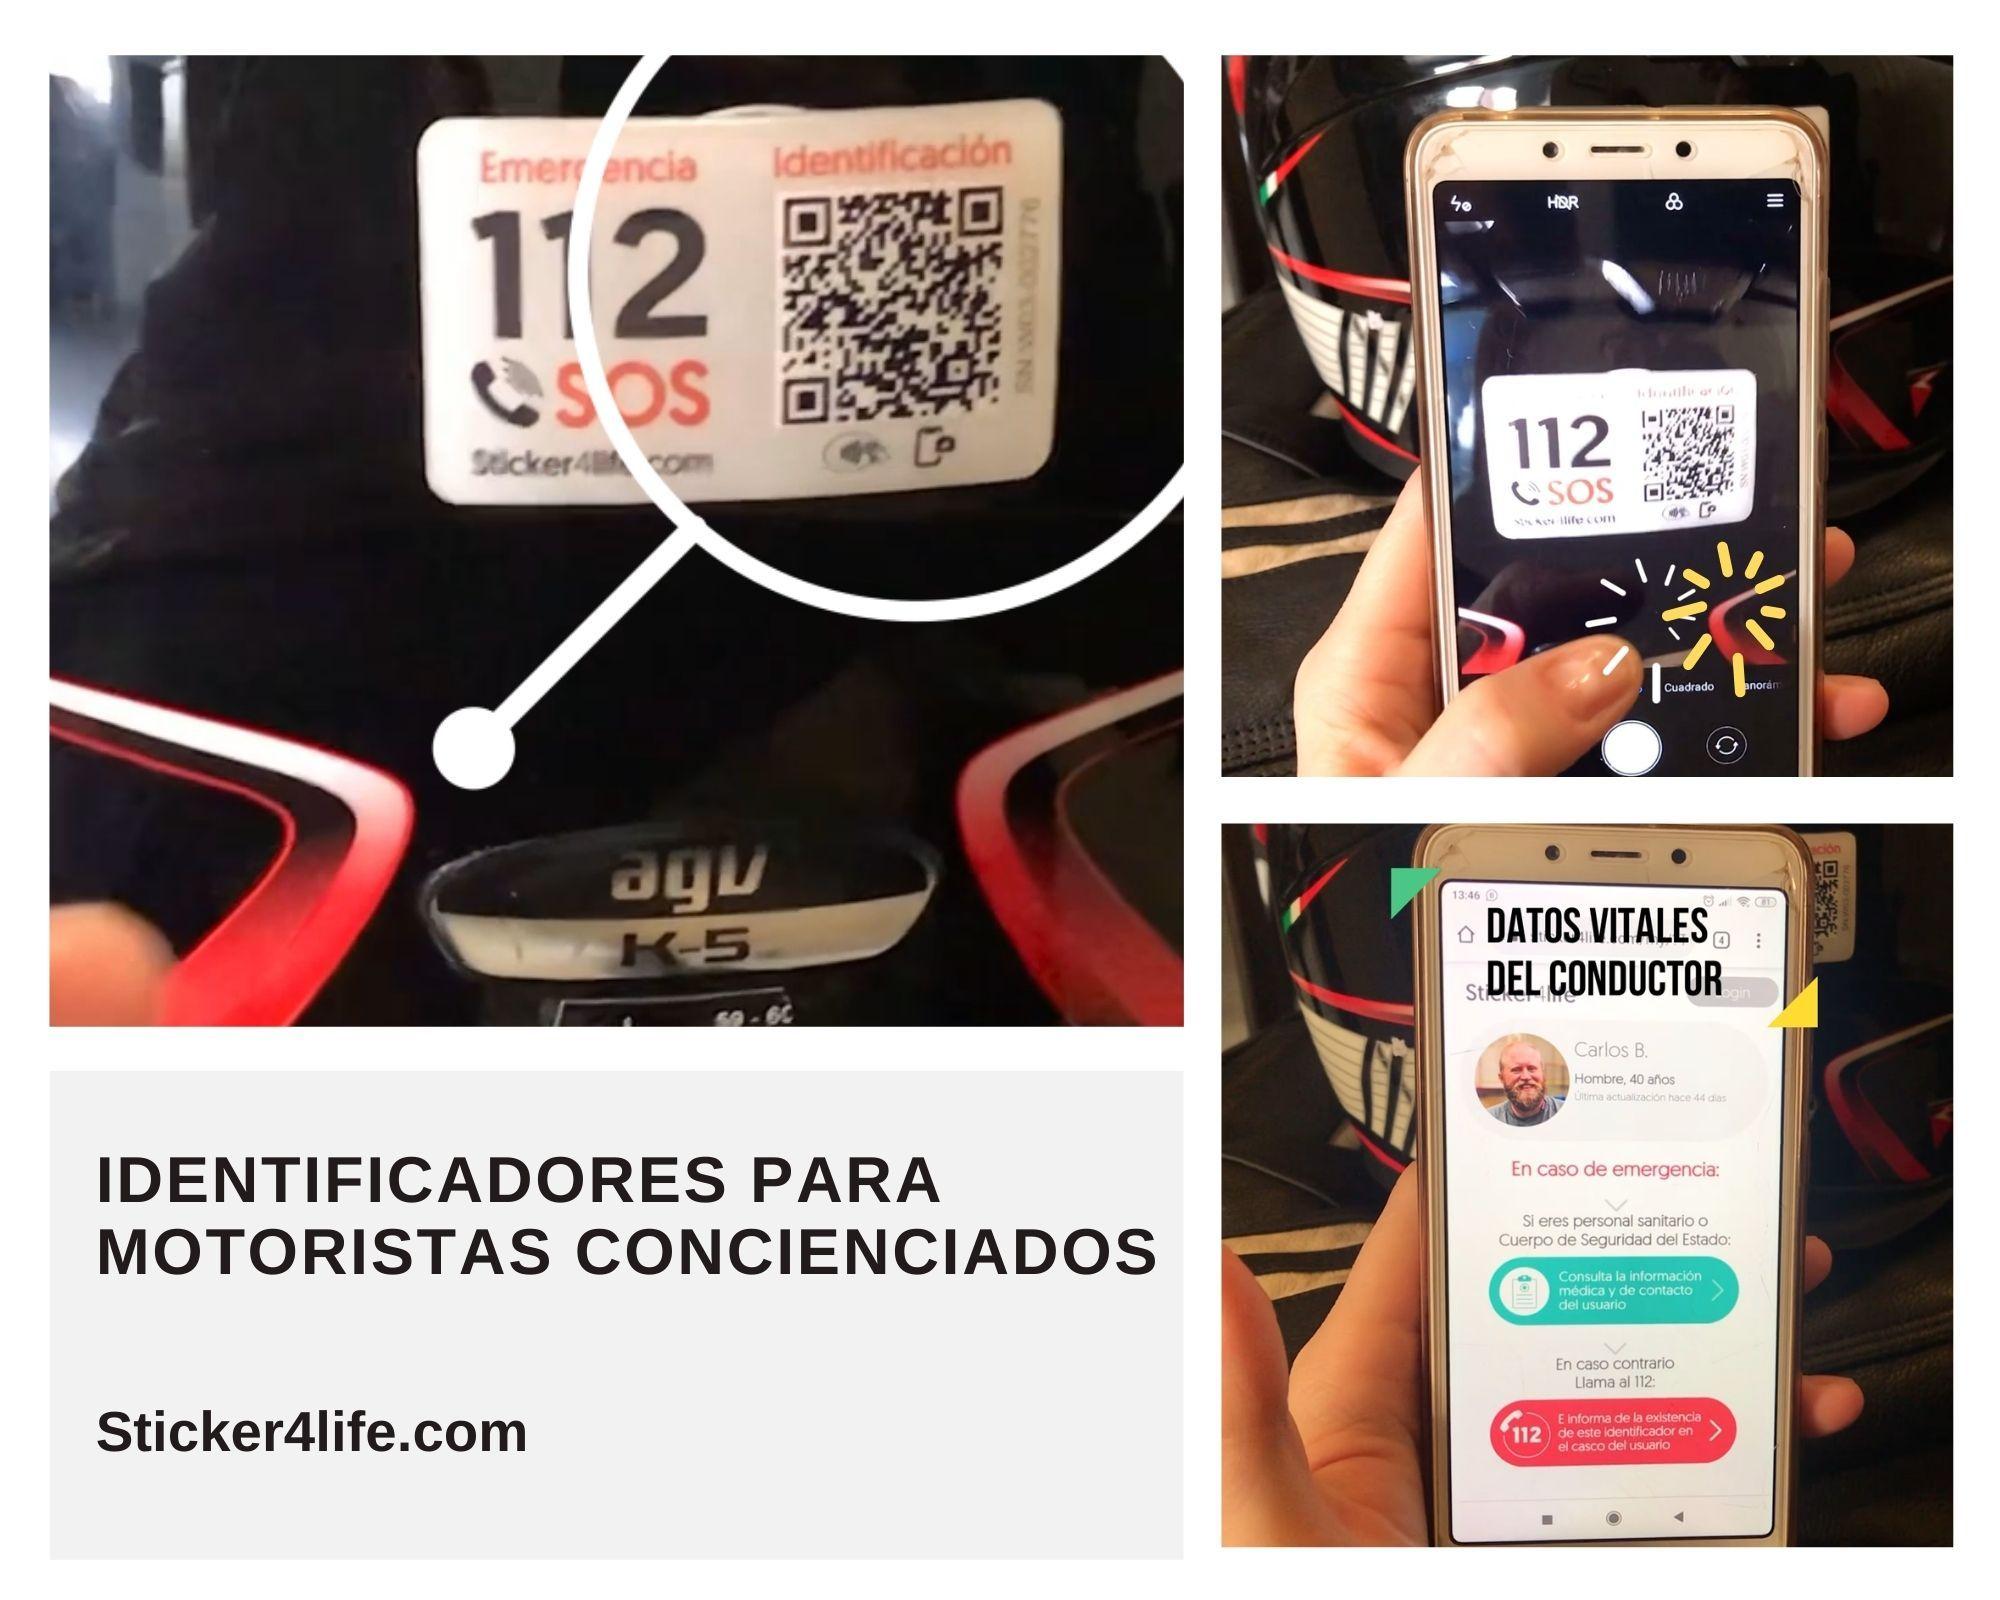 Sticker4life